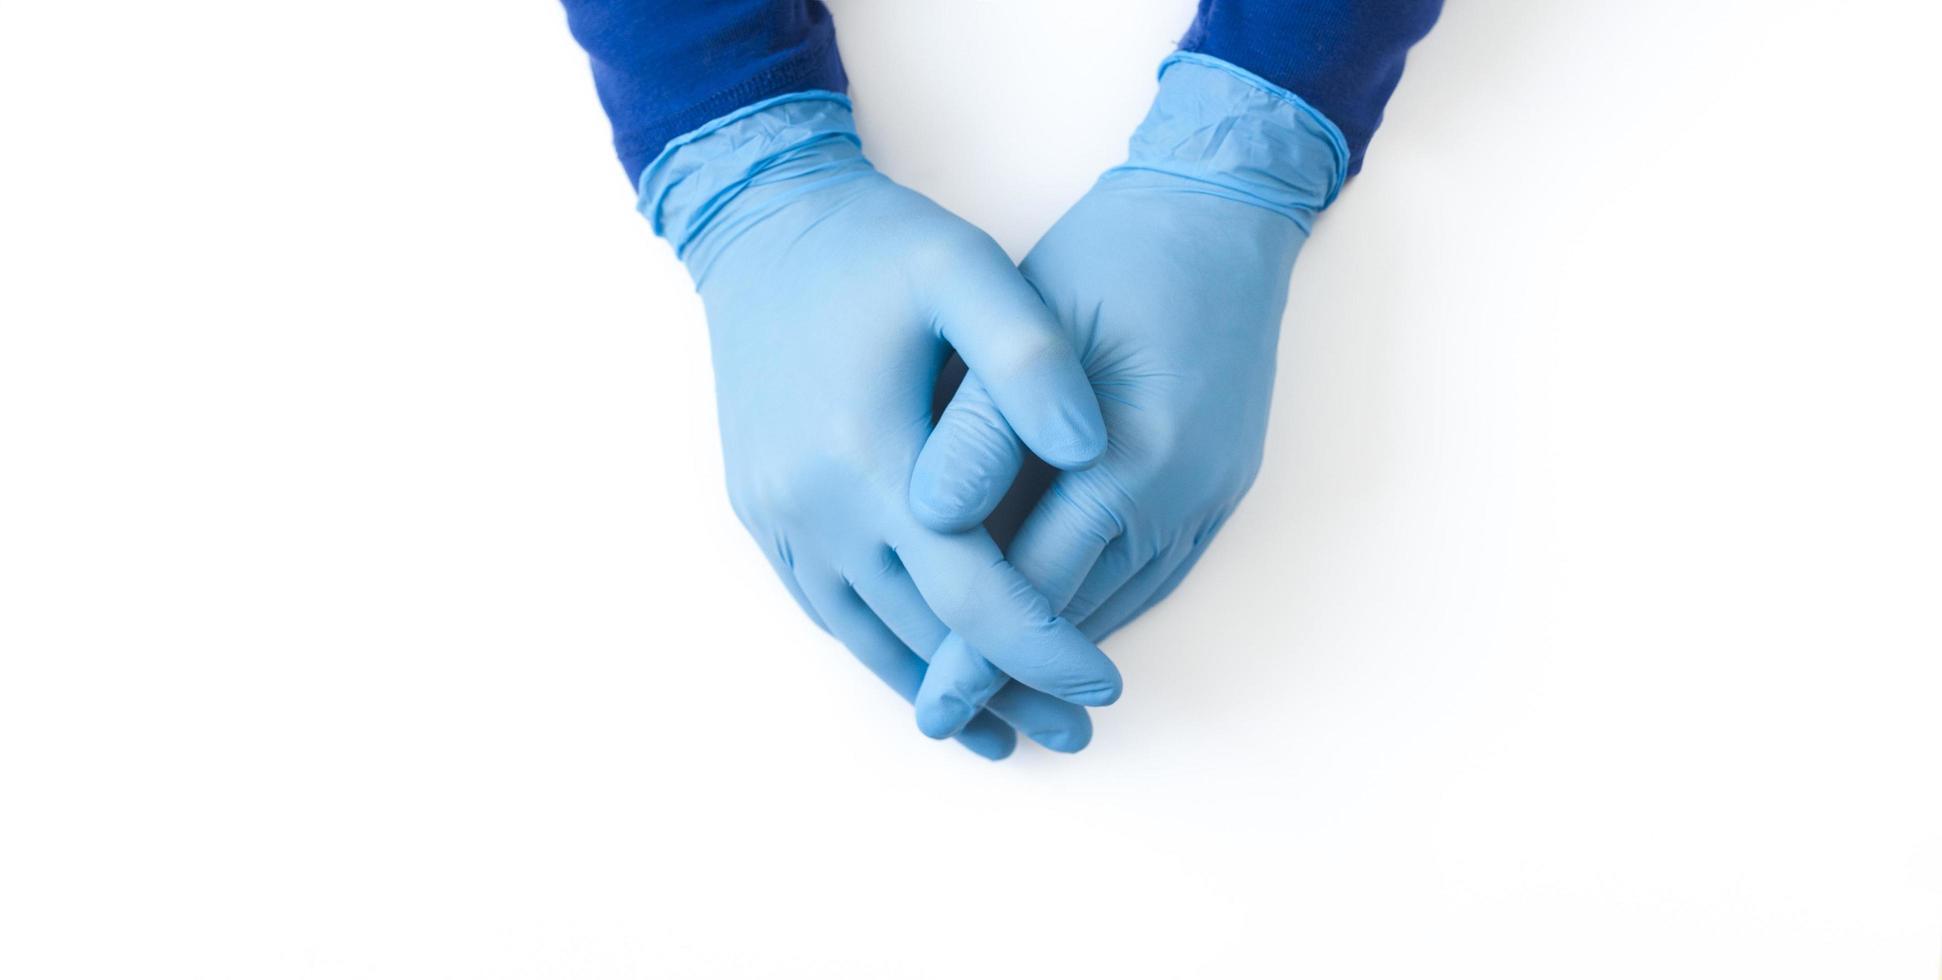 banner de guantes de nitrilo azul foto